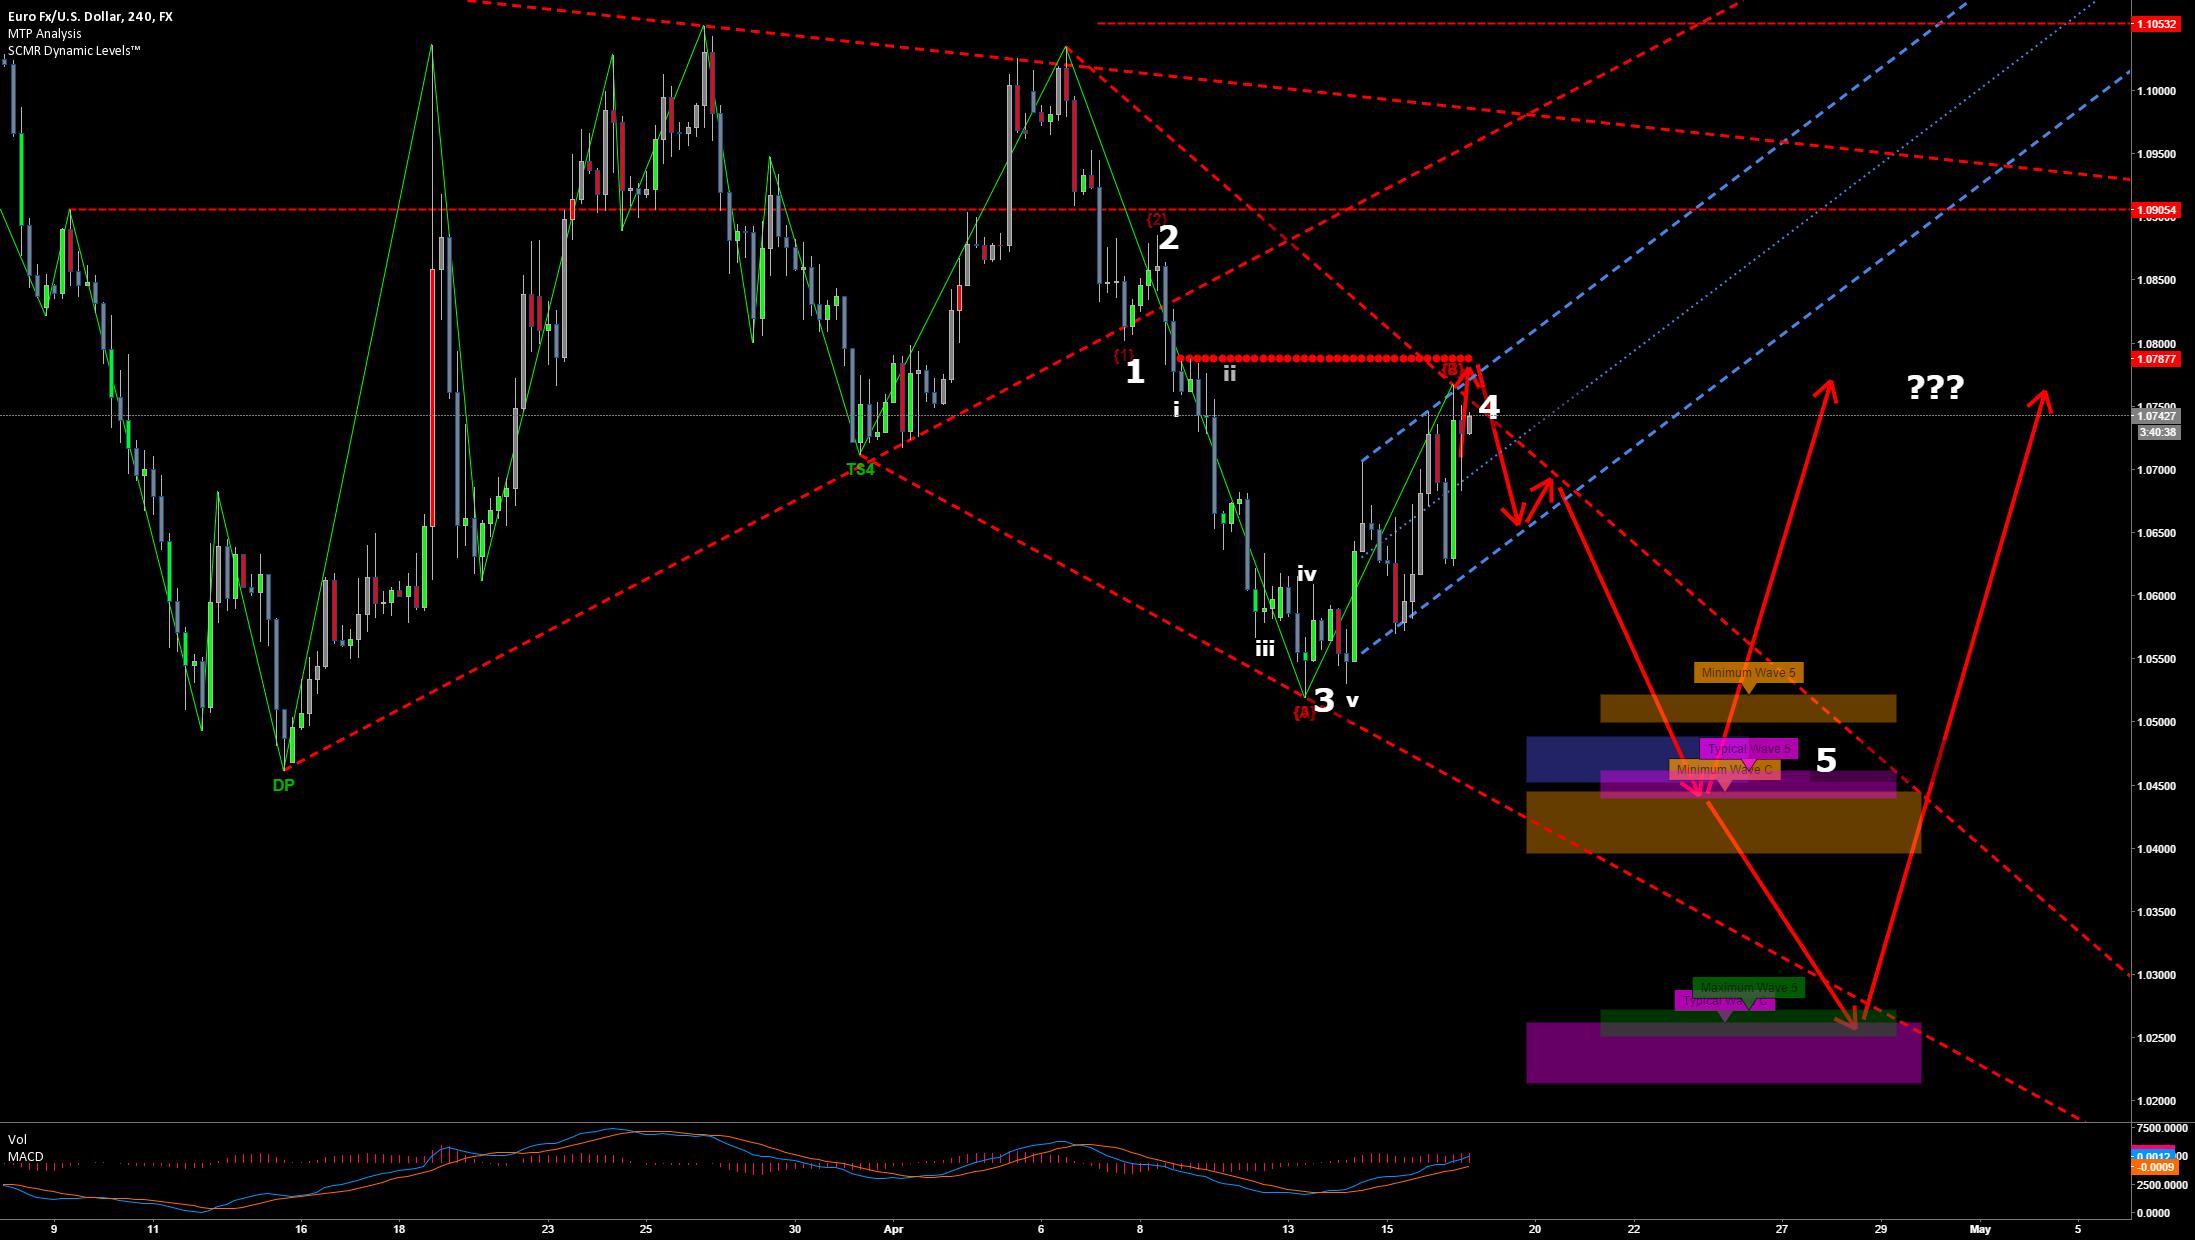 EURUSD Wave 5 targets